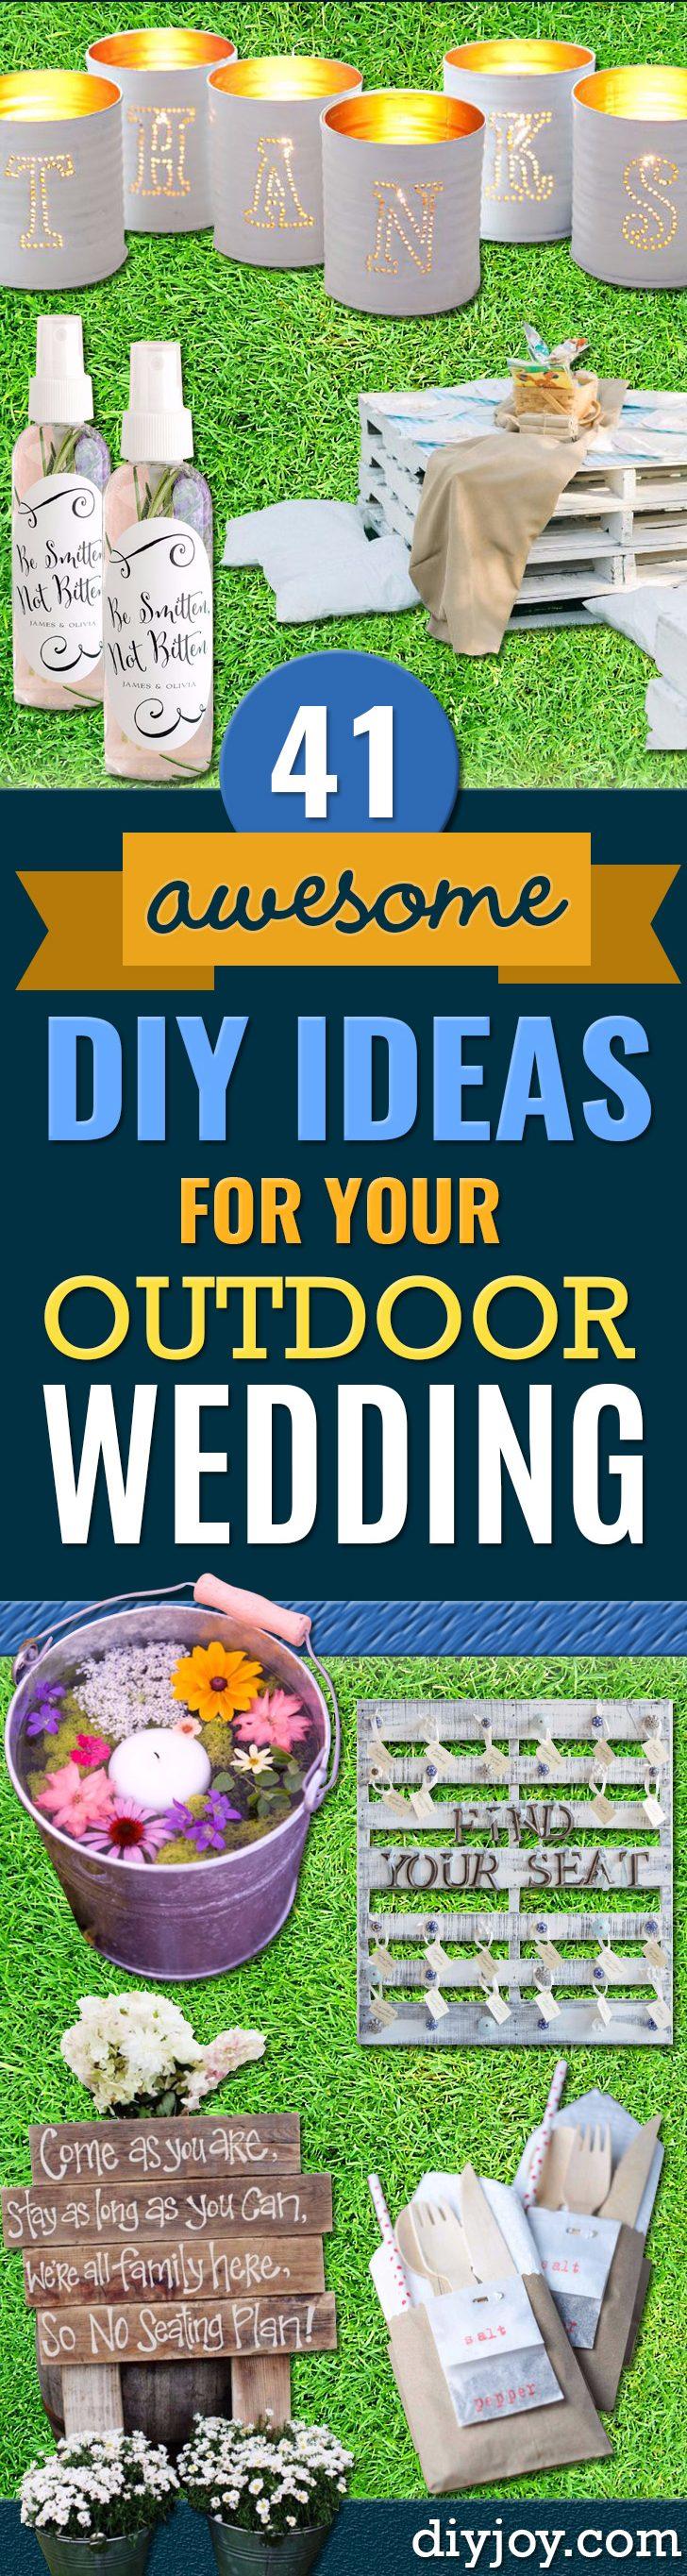 diy outdoor wedding ideas - summer wedding idea diy Lighting, Mason Jar Centerpieces, Table Decor, Party Favors, Guestbook Ideas, Signs, Flowers